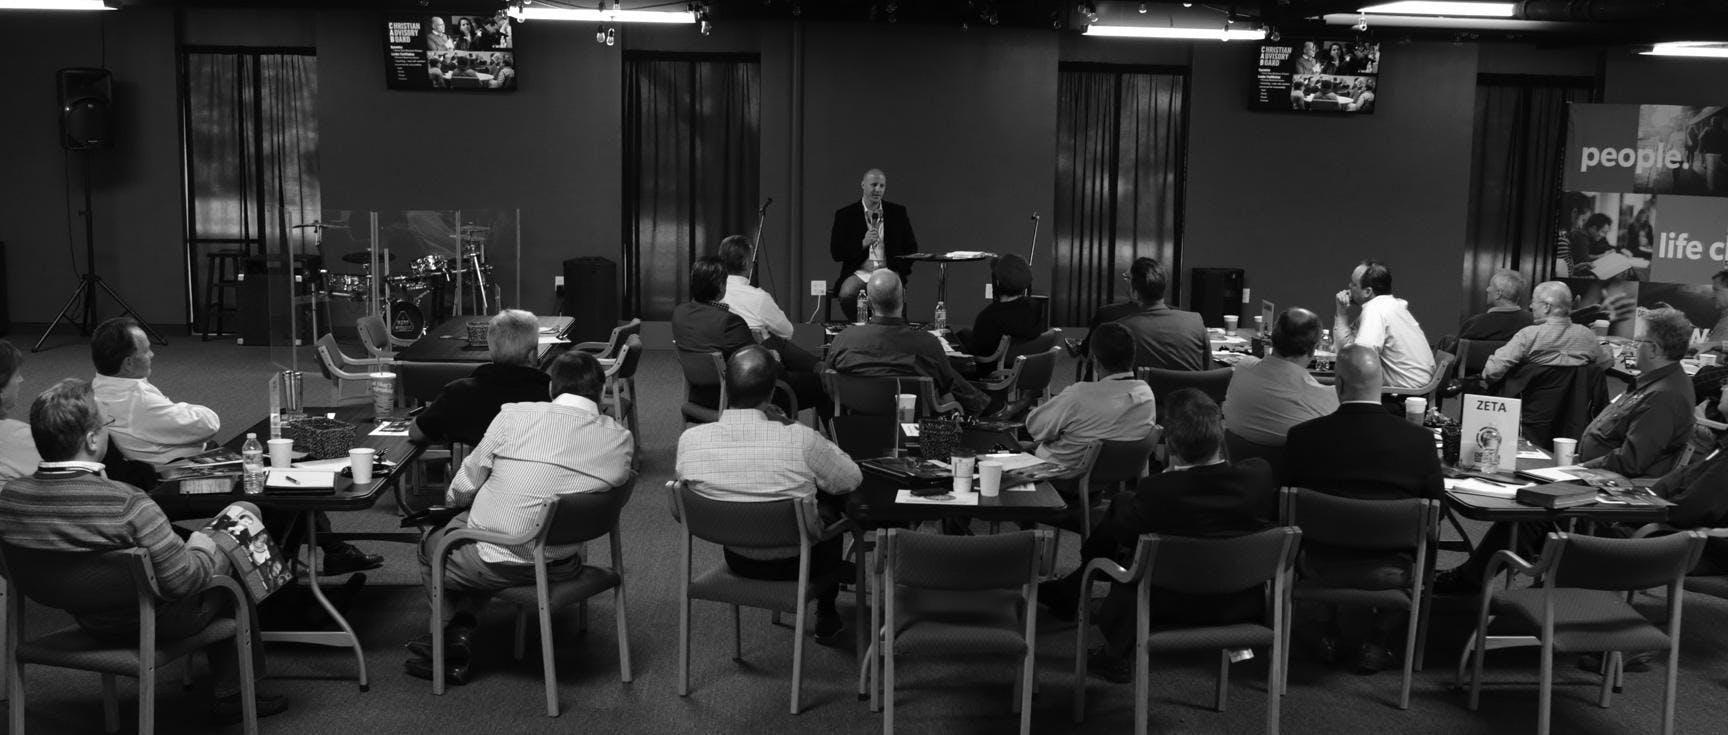 Christian Business Fellowship - Granger, IN Monthly Meeting